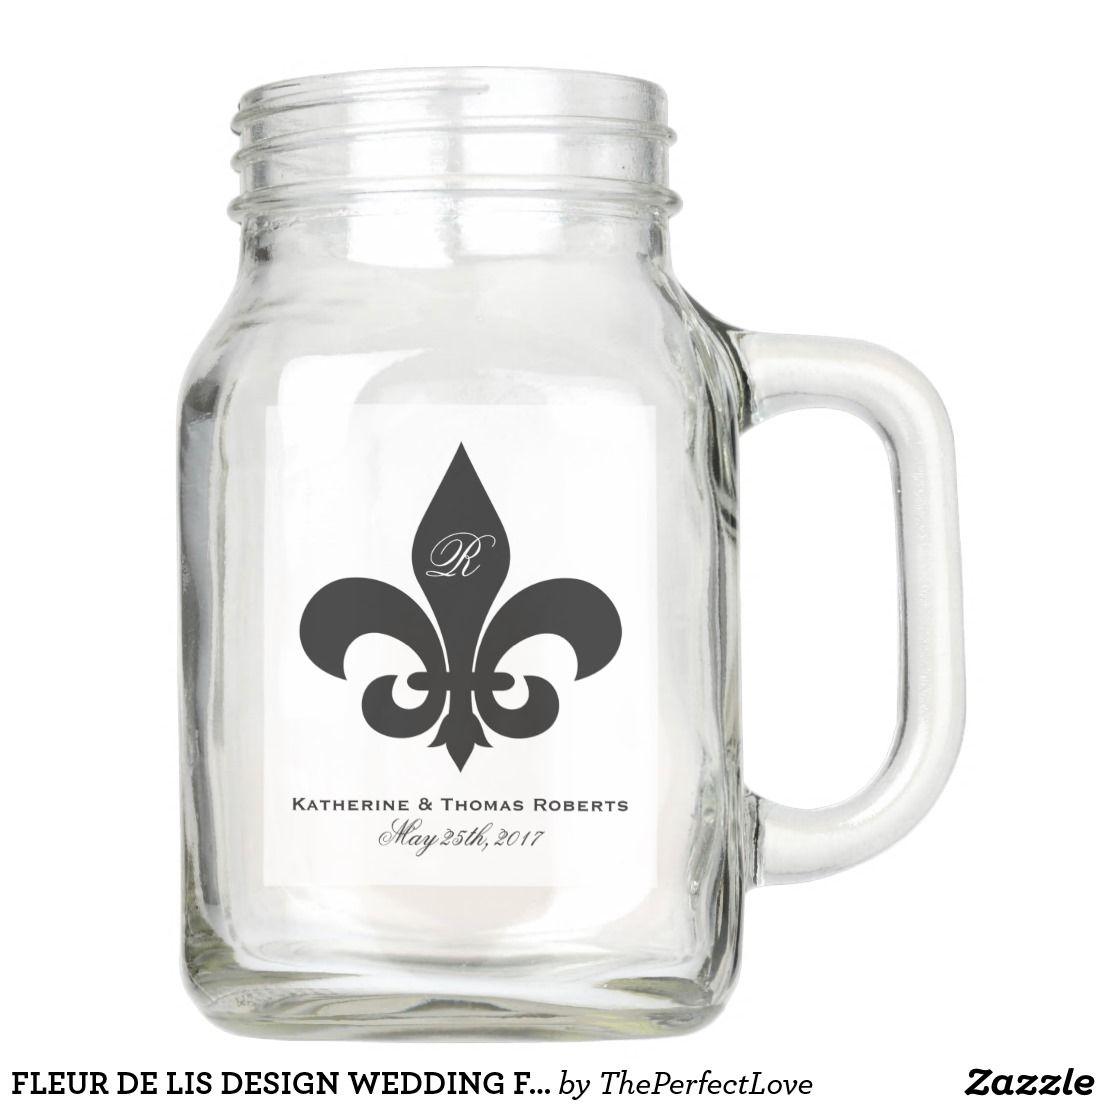 FLEUR DE LIS DESIGN WEDDING FAVOR MASON JAR 20oz | ThePerfectLove ...